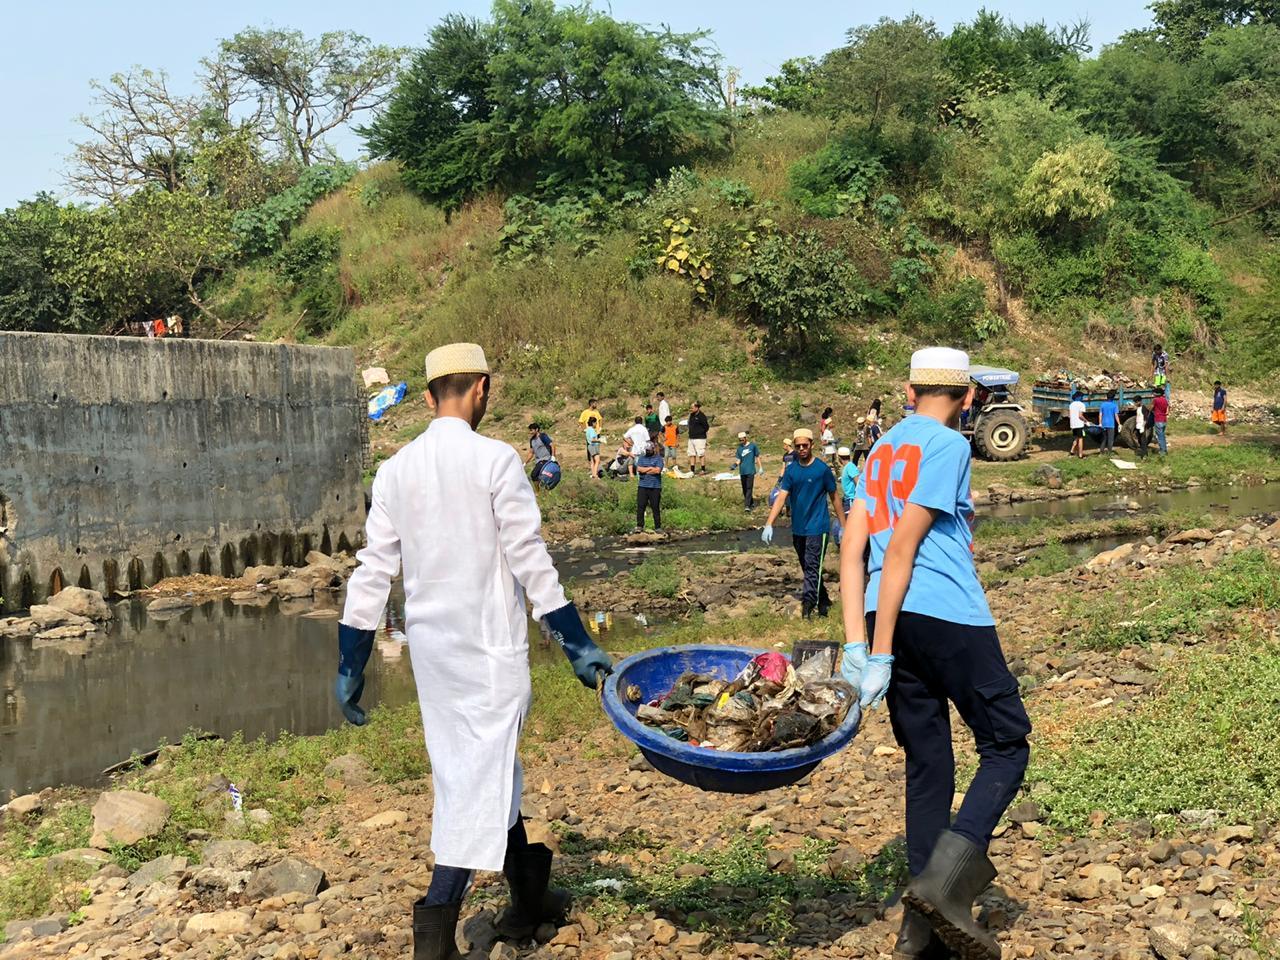 Aljamea-tus-Saifiyah, Mithi River, Marol, Mumbai, Turning the Tide, Plastic Pollution, Project Rise, Environment, Afroz Shah